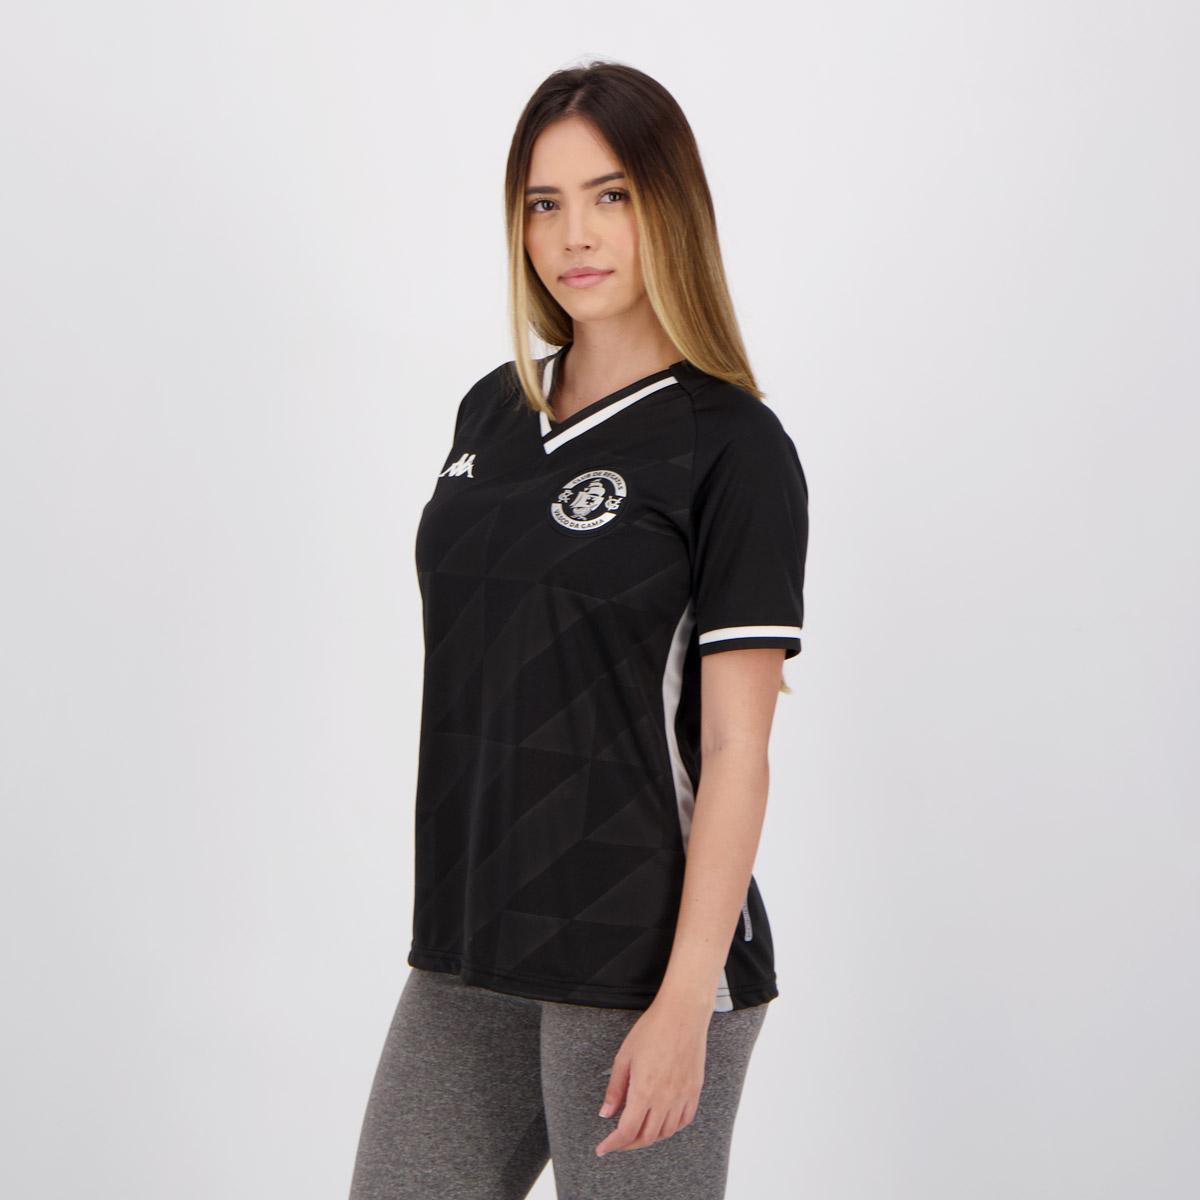 Camisa Kappa Vasco 3 2021 Feminina